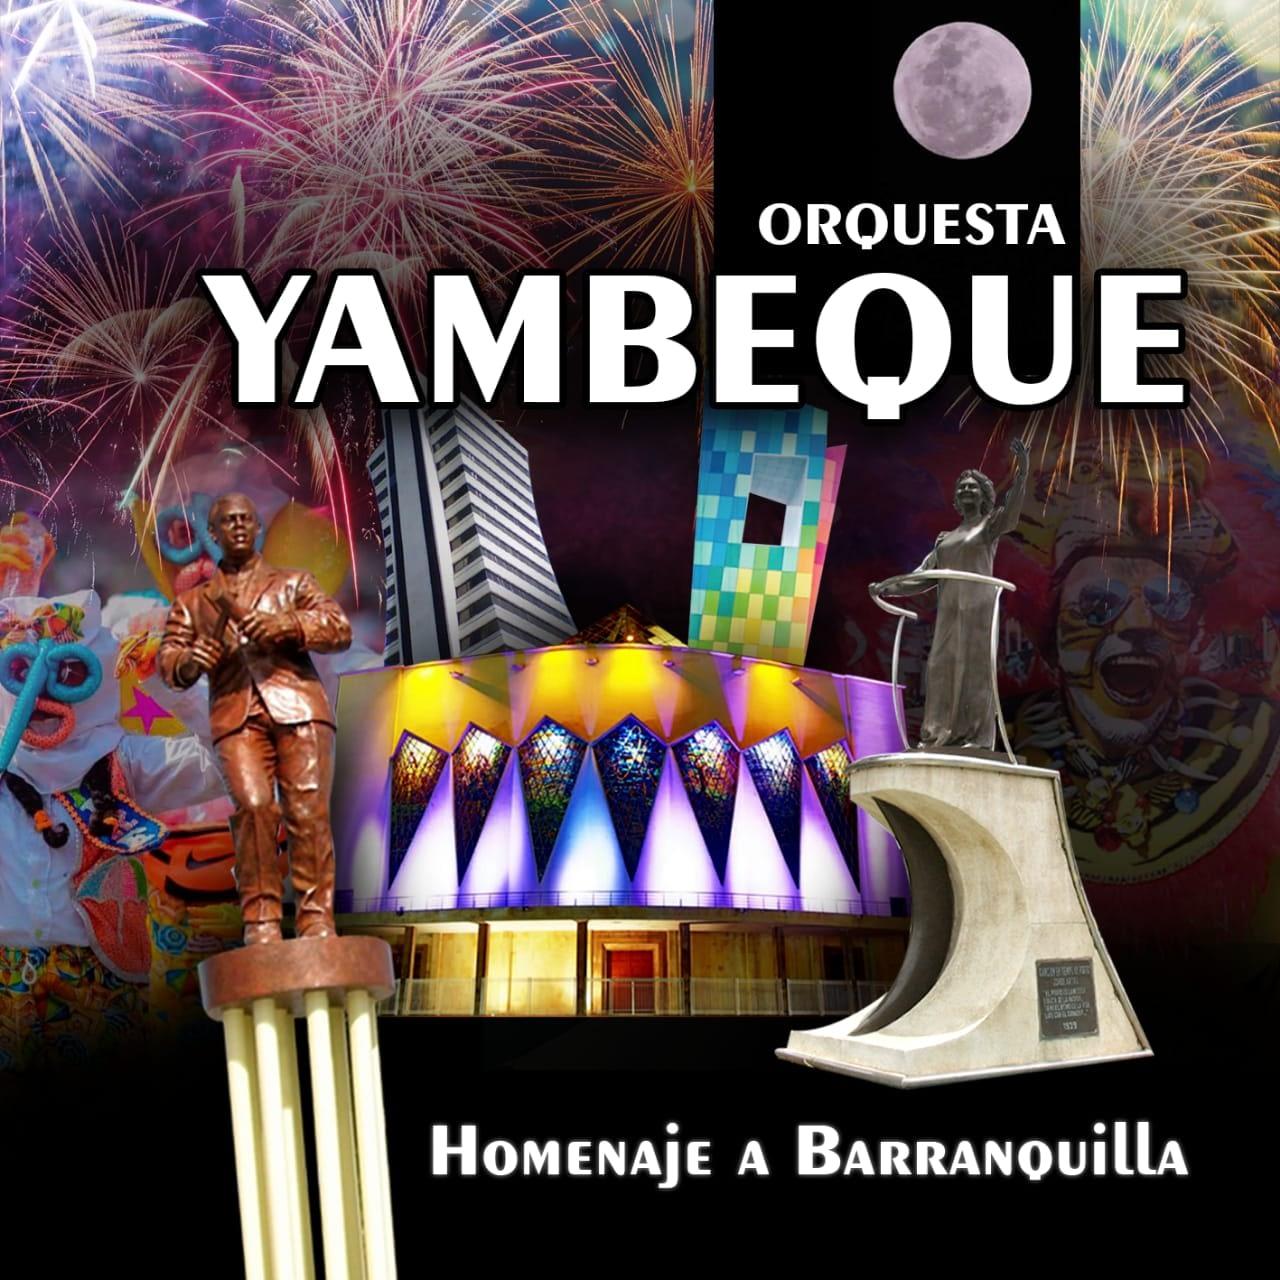 Barranquillero - Orquesta Yambeque